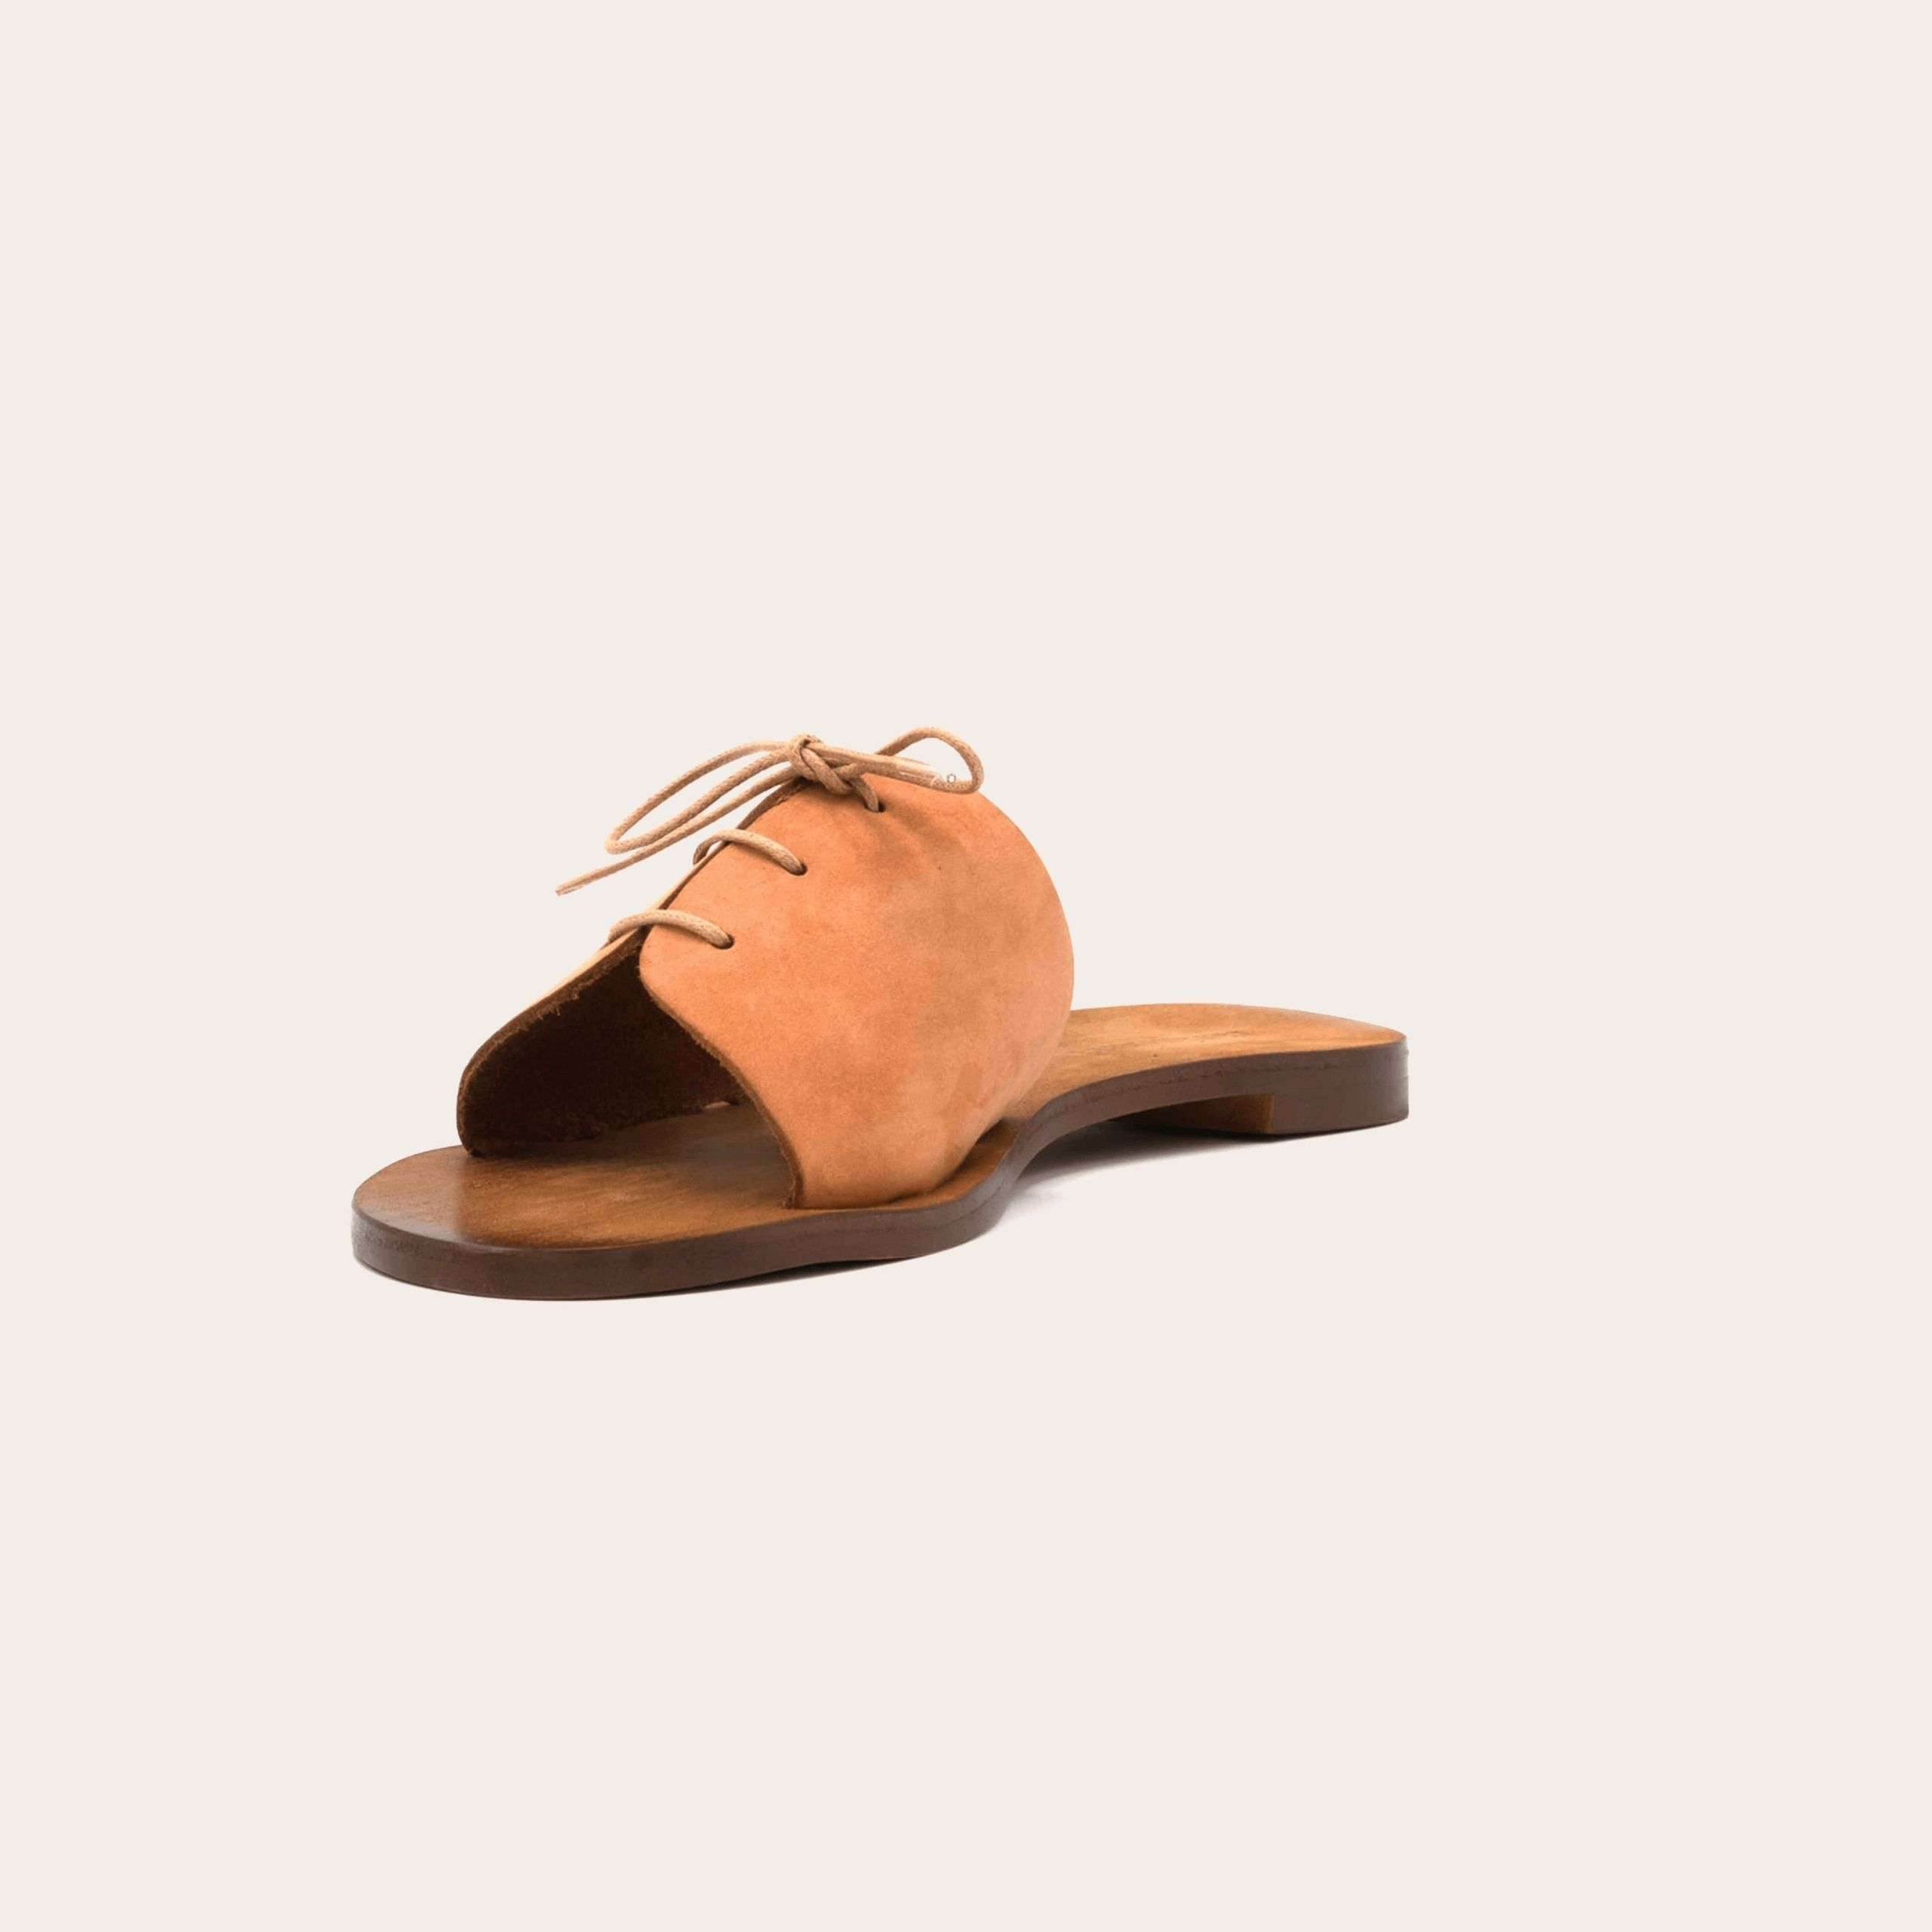 cali-rose_3_lintsandalen sandals travelsandals vegan sustainable sandals wikkelsandalen